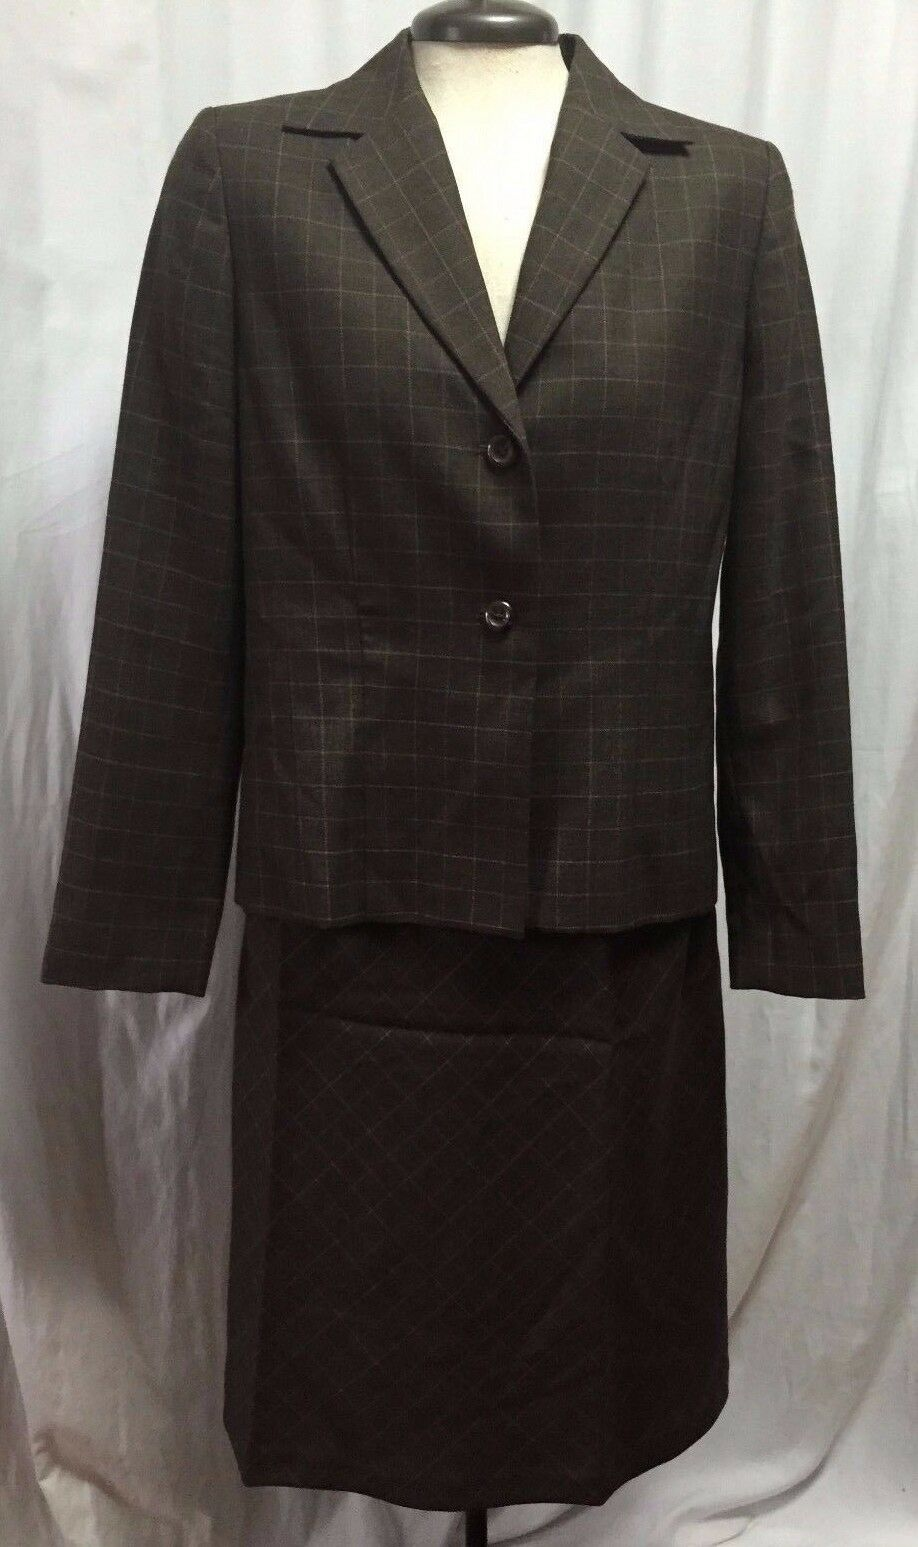 Pendleton 100% Virgin Wool 2 Piece Suit Skirt Blazer Womens 6 Brown Plaid Dress